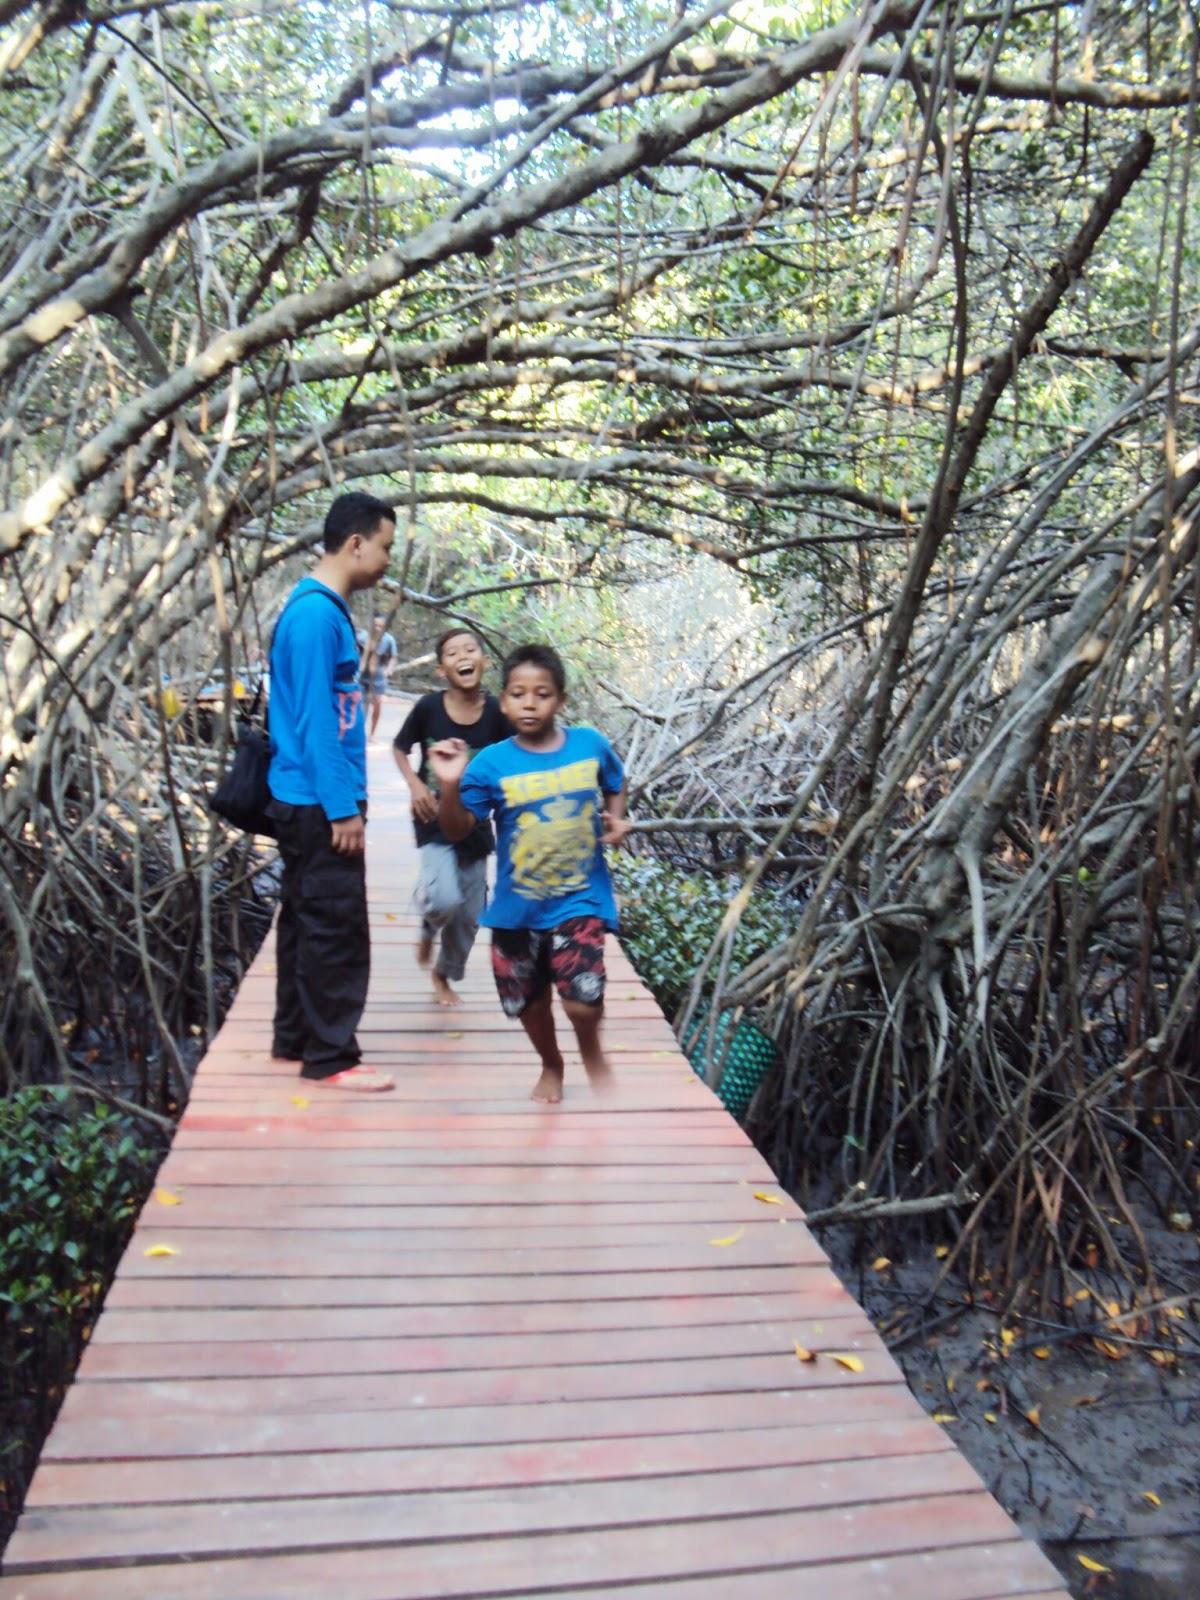 Menyeberangi Jembatan Mangrove Rembang Kesejukan Tengah Hutan Ketika Sampai Jalan